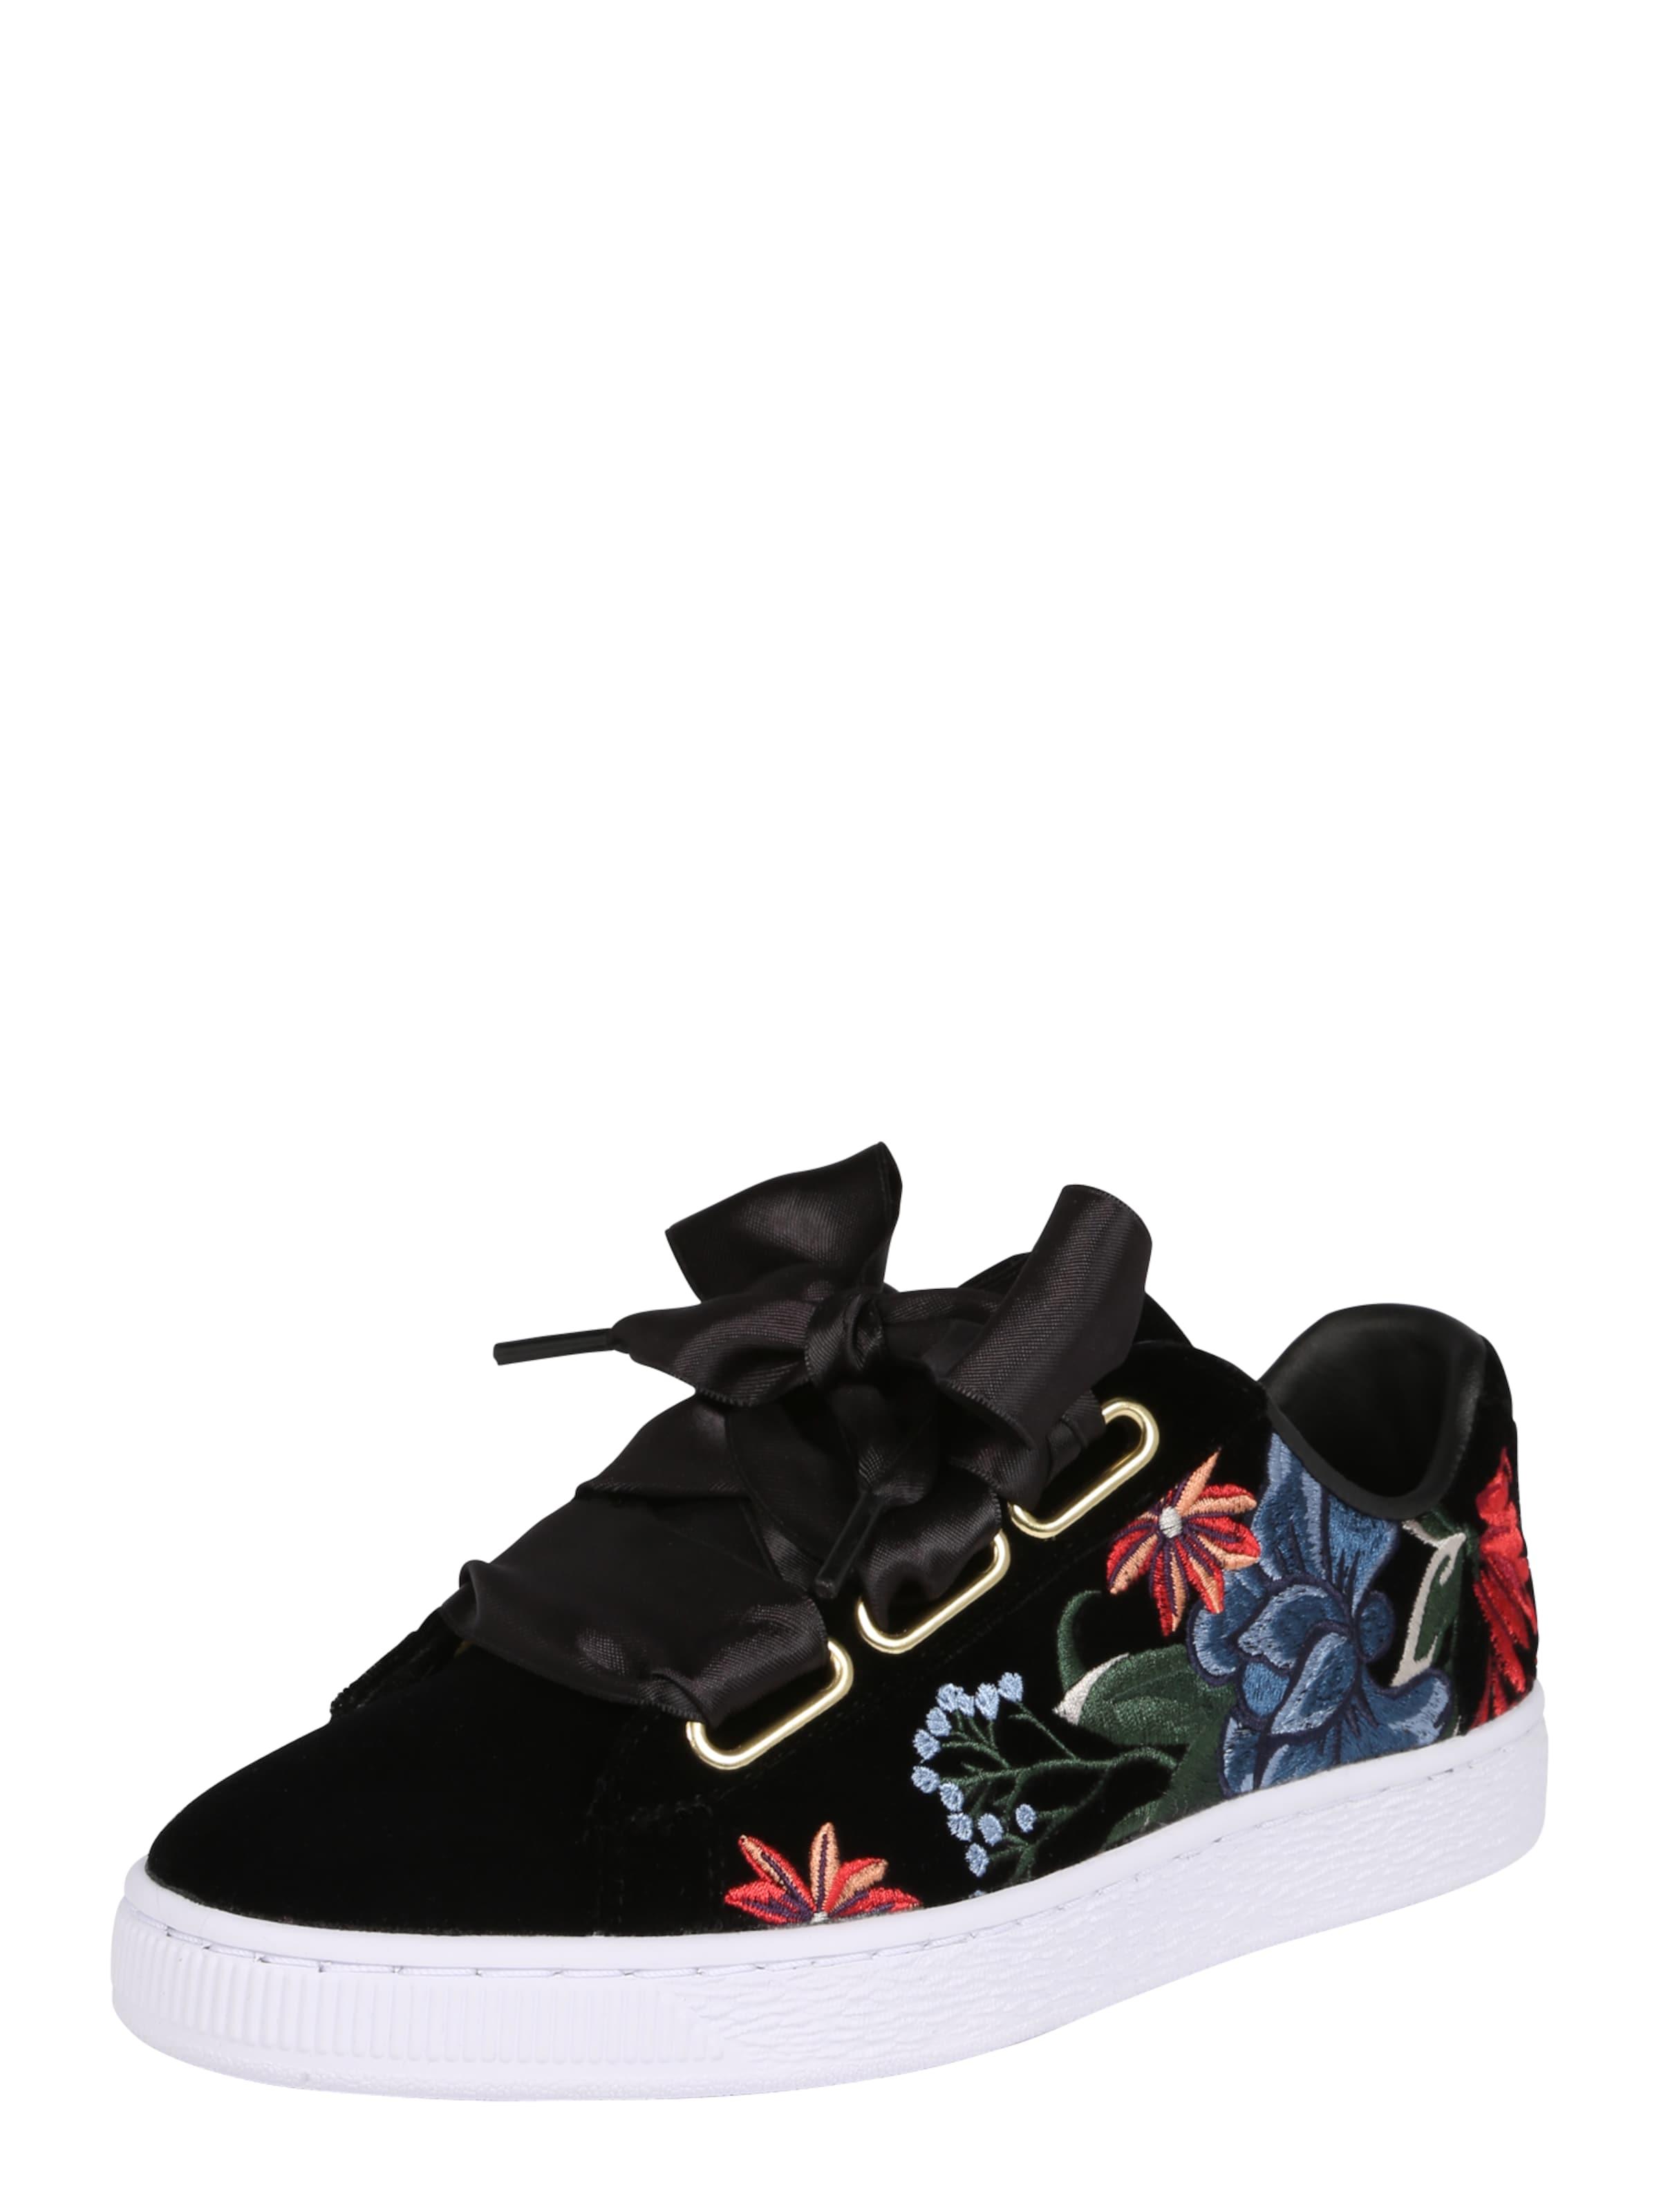 PUMA Sneaker Heart Hyper Verschleißfeste billige Schuhe